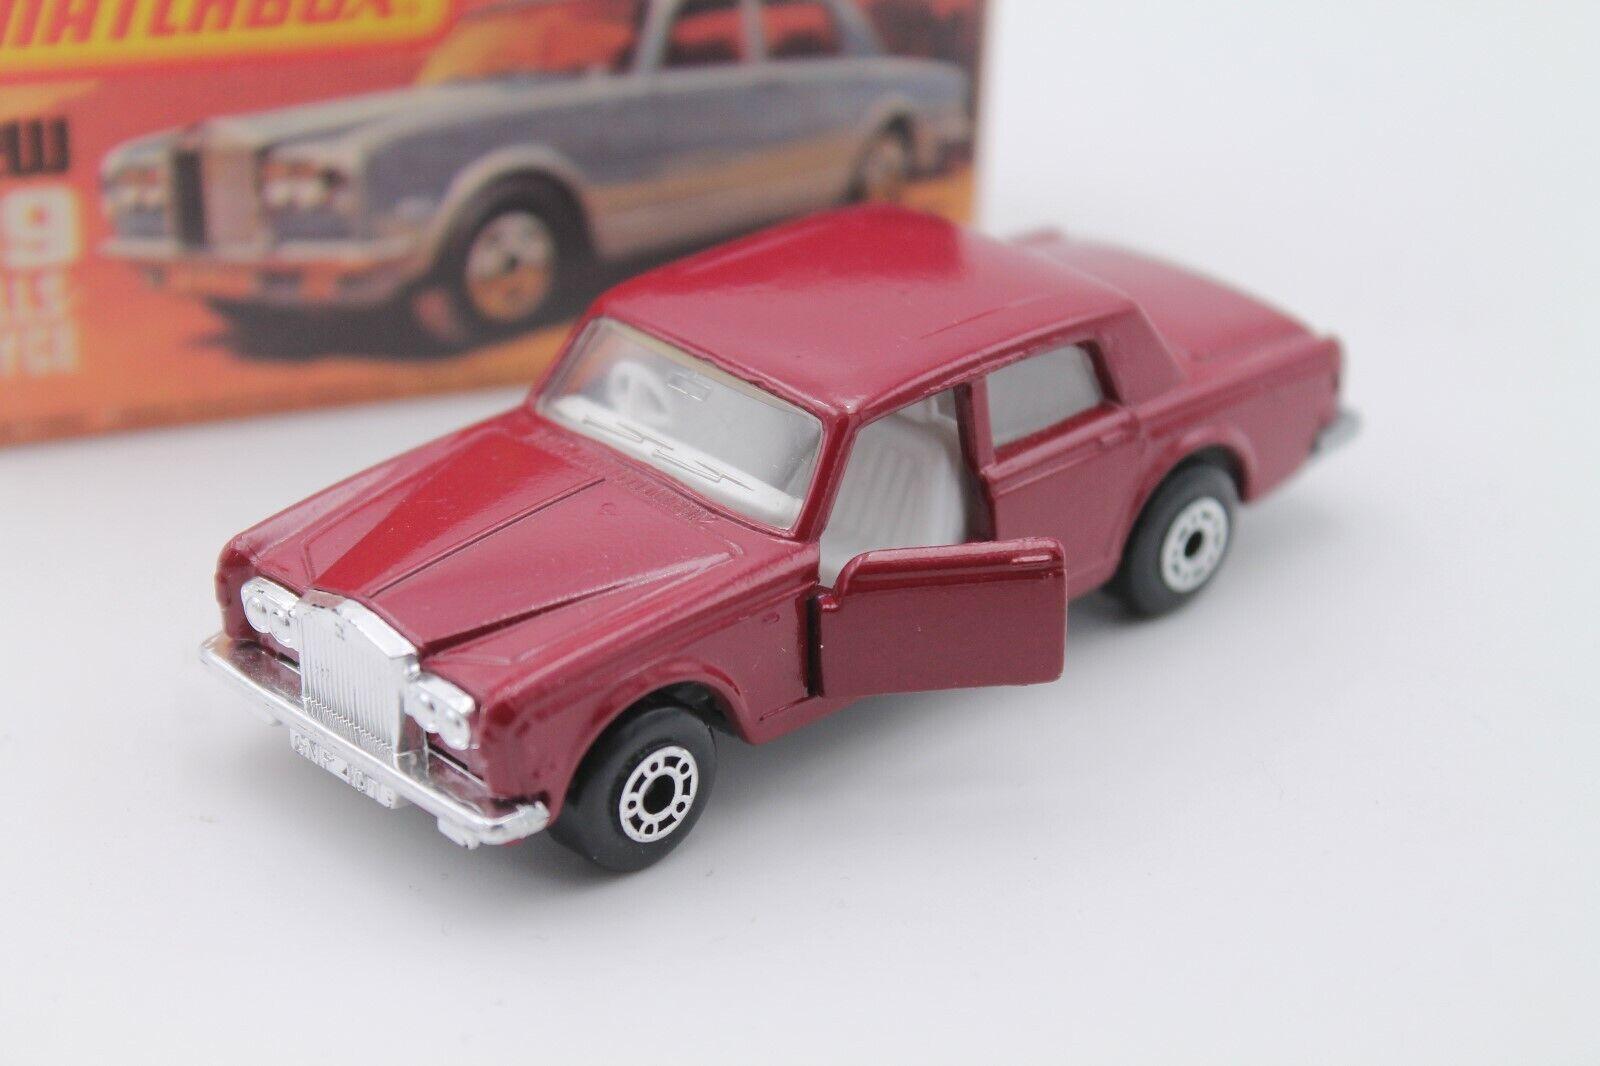 MATCHscatola SUPERFAST 39  RollsRoyce argento Shadow  OVP  Dark rosso  1979